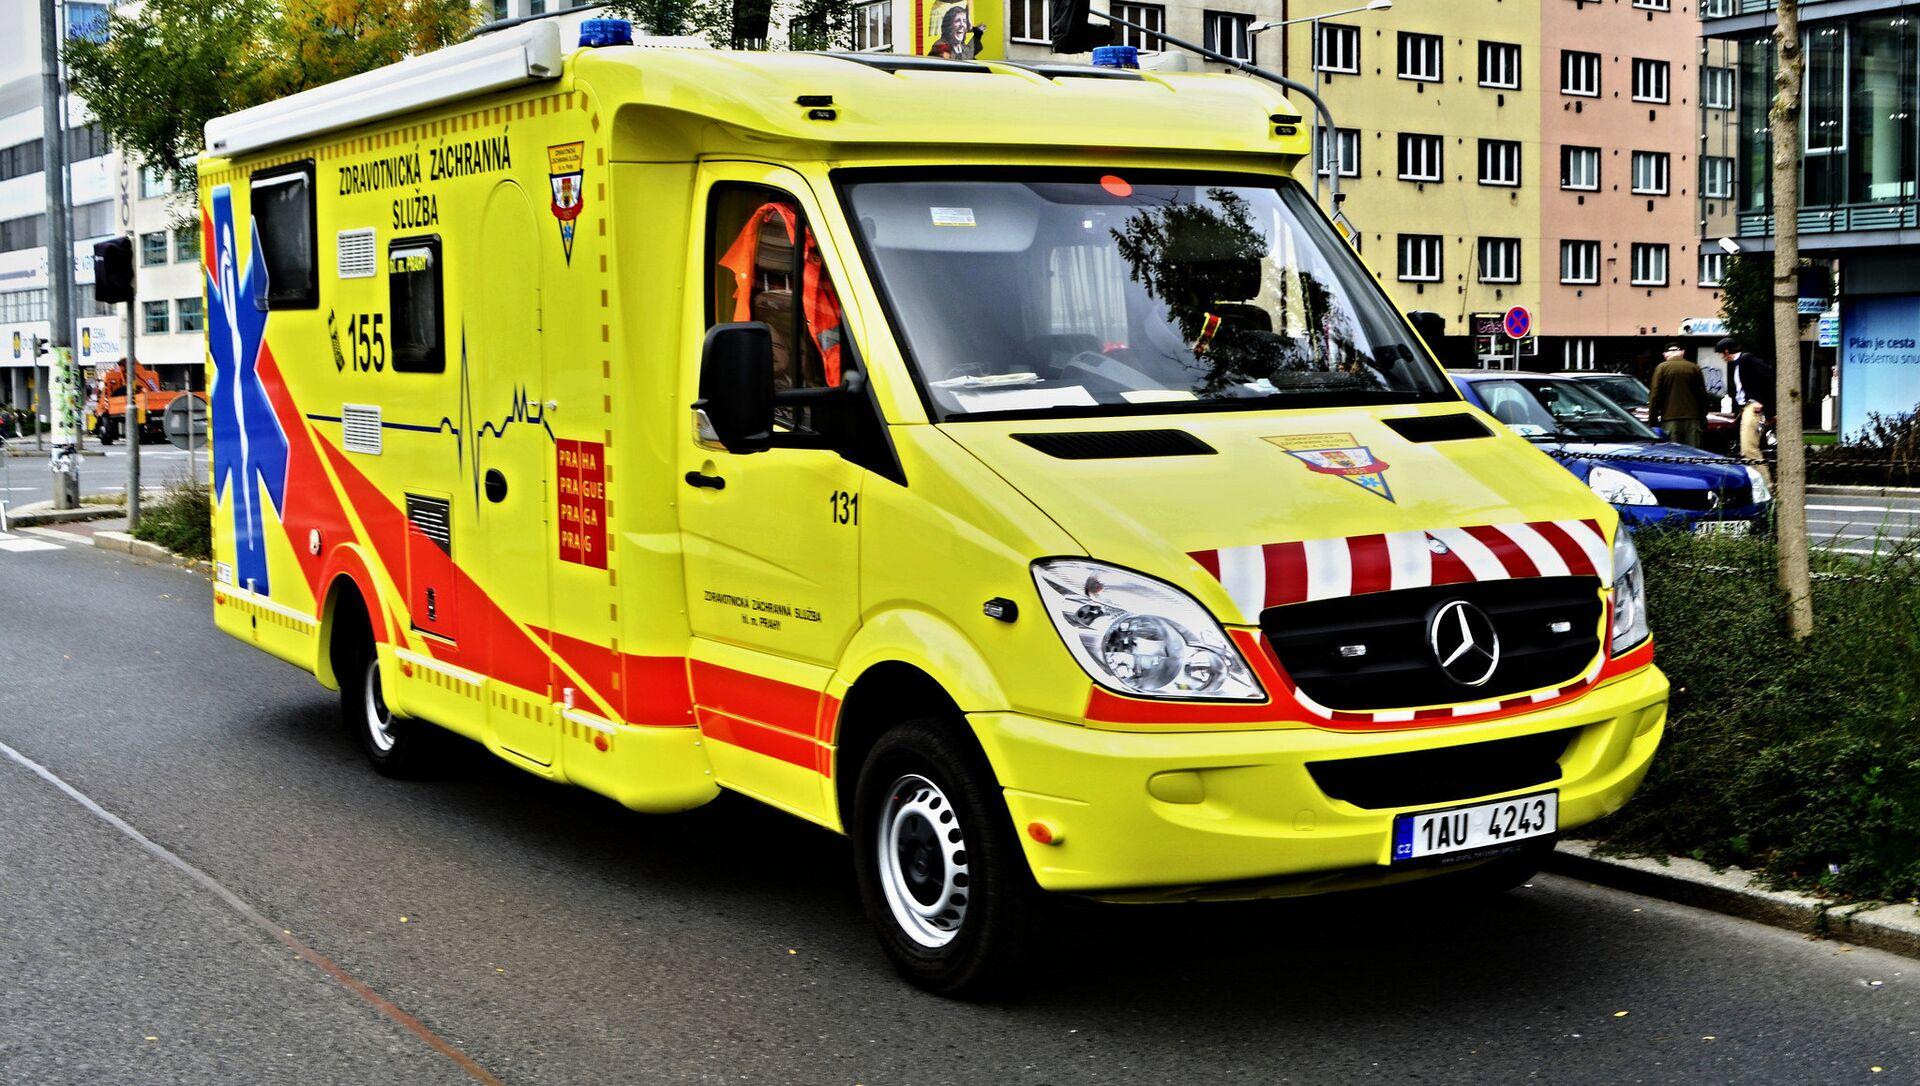 Ambulance in Czech Republic - Sputnik International, 1920, 04.08.2021